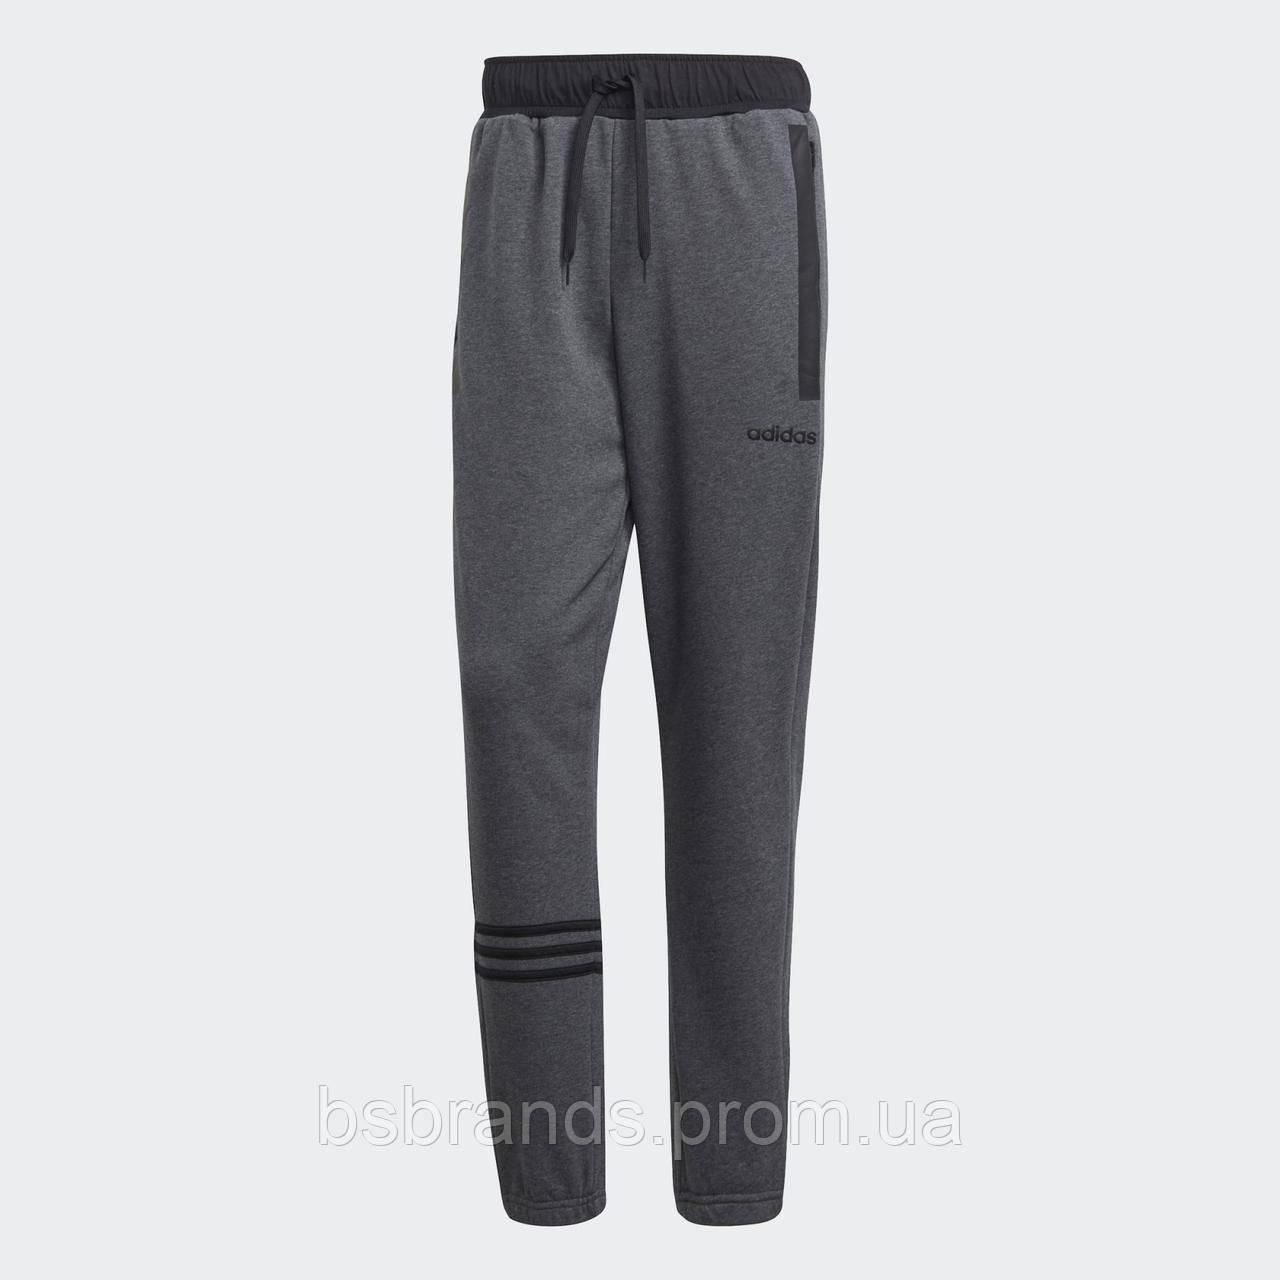 Мужские штаны adidasEssentials Motion Pack DU0439 (2020/1)